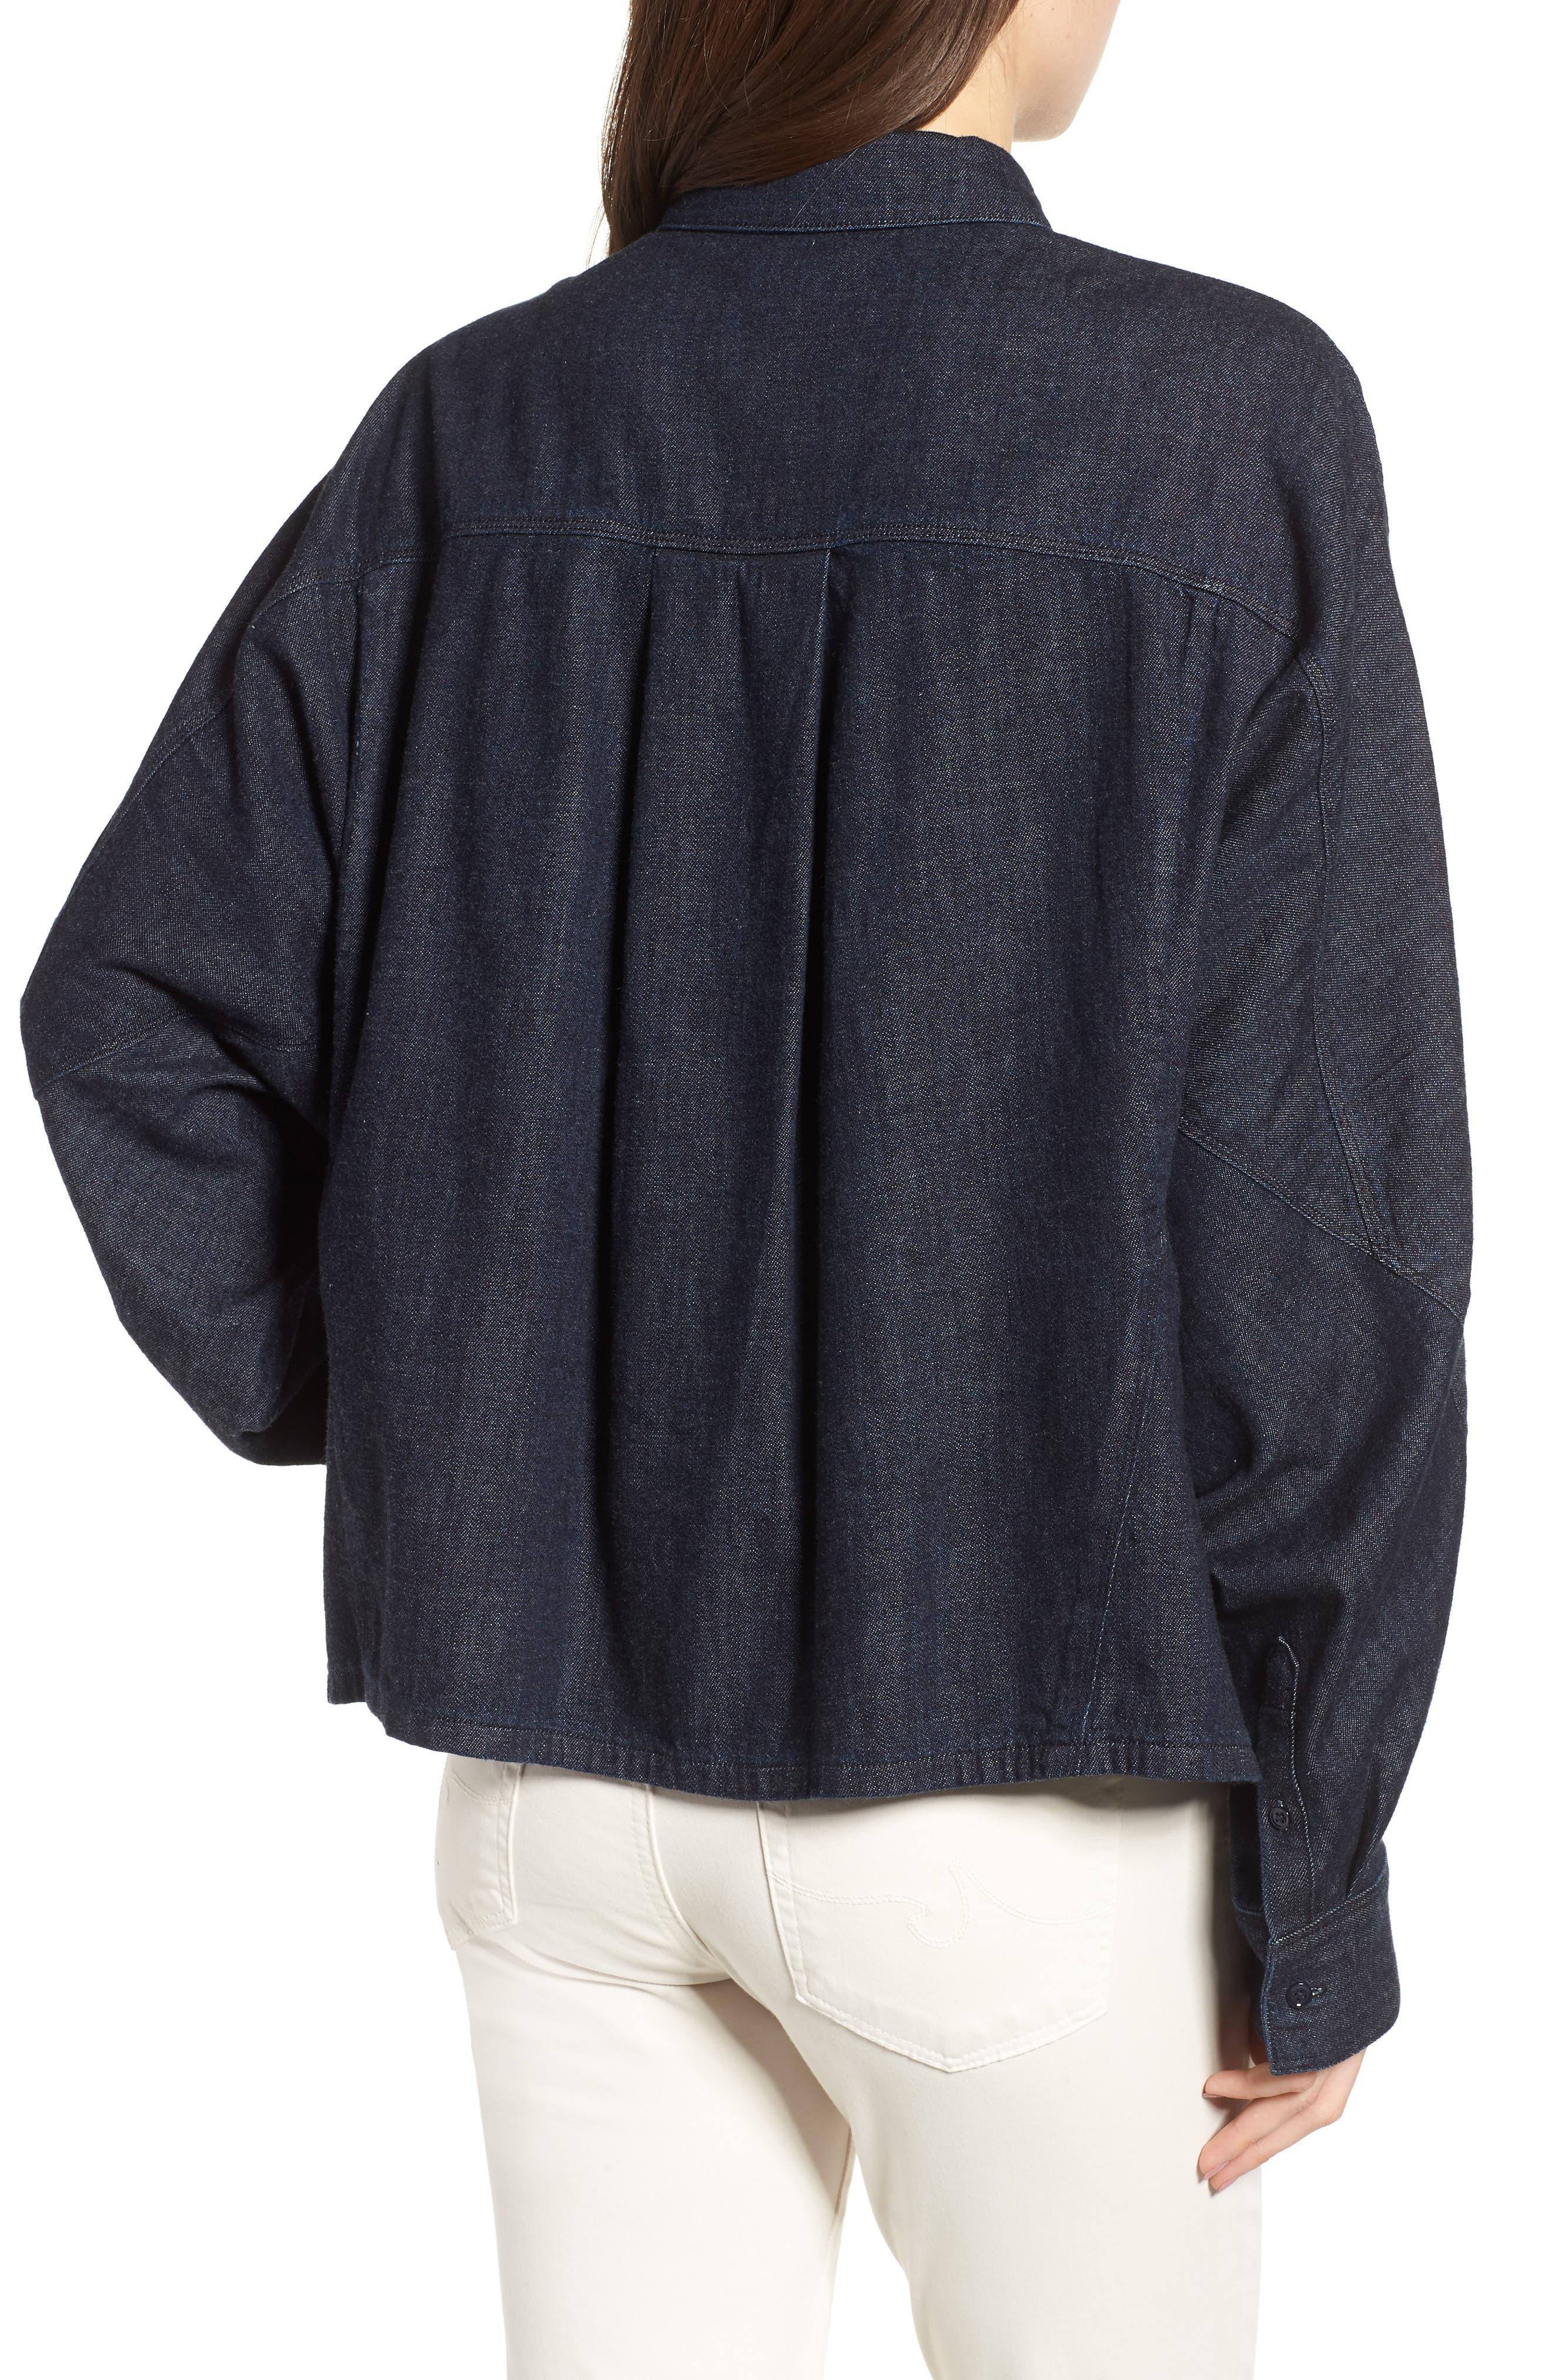 Acoustic Denim Shirt,                             Alternate thumbnail 2, color,                             439